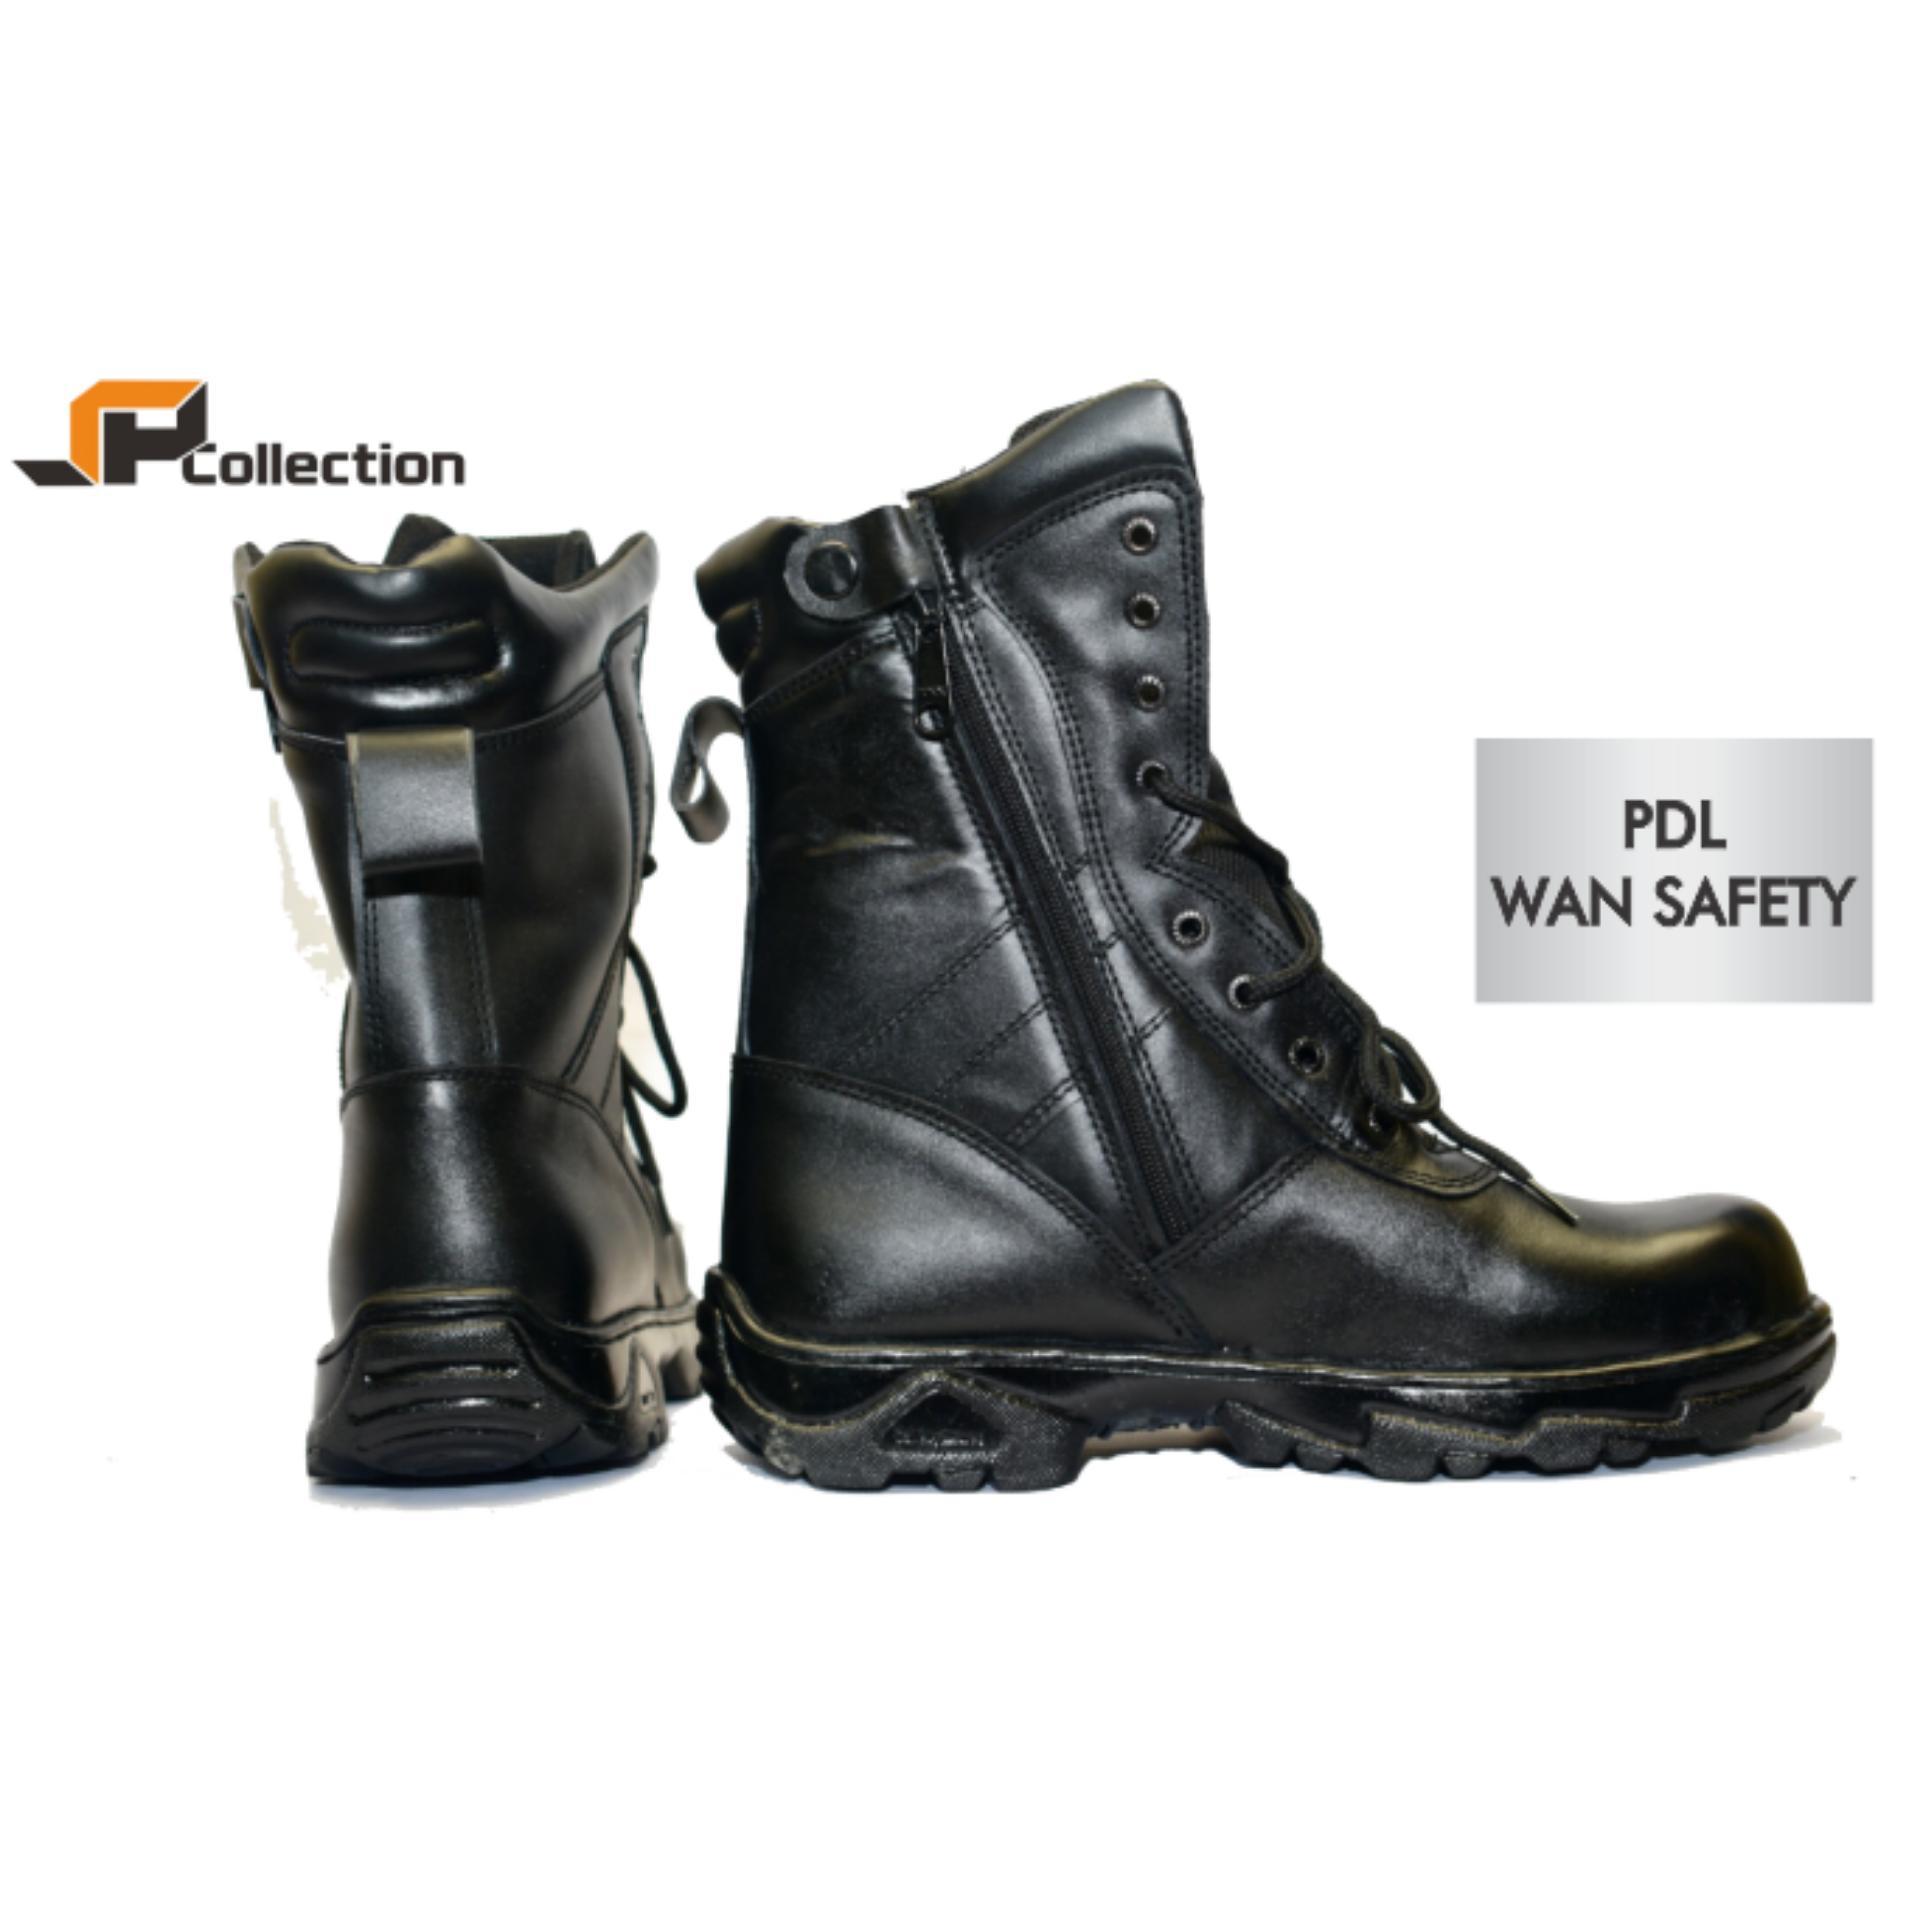 JAFERI Sepatu Boots PDL Wan Safety Warna Hitam Bahan Kulit Sapi Asli Sepatu Jatah TNI Polri Dengan Besi Pengaman, Cocok Juga Untuk Security, DAMKAR, Pertambangan, Dll